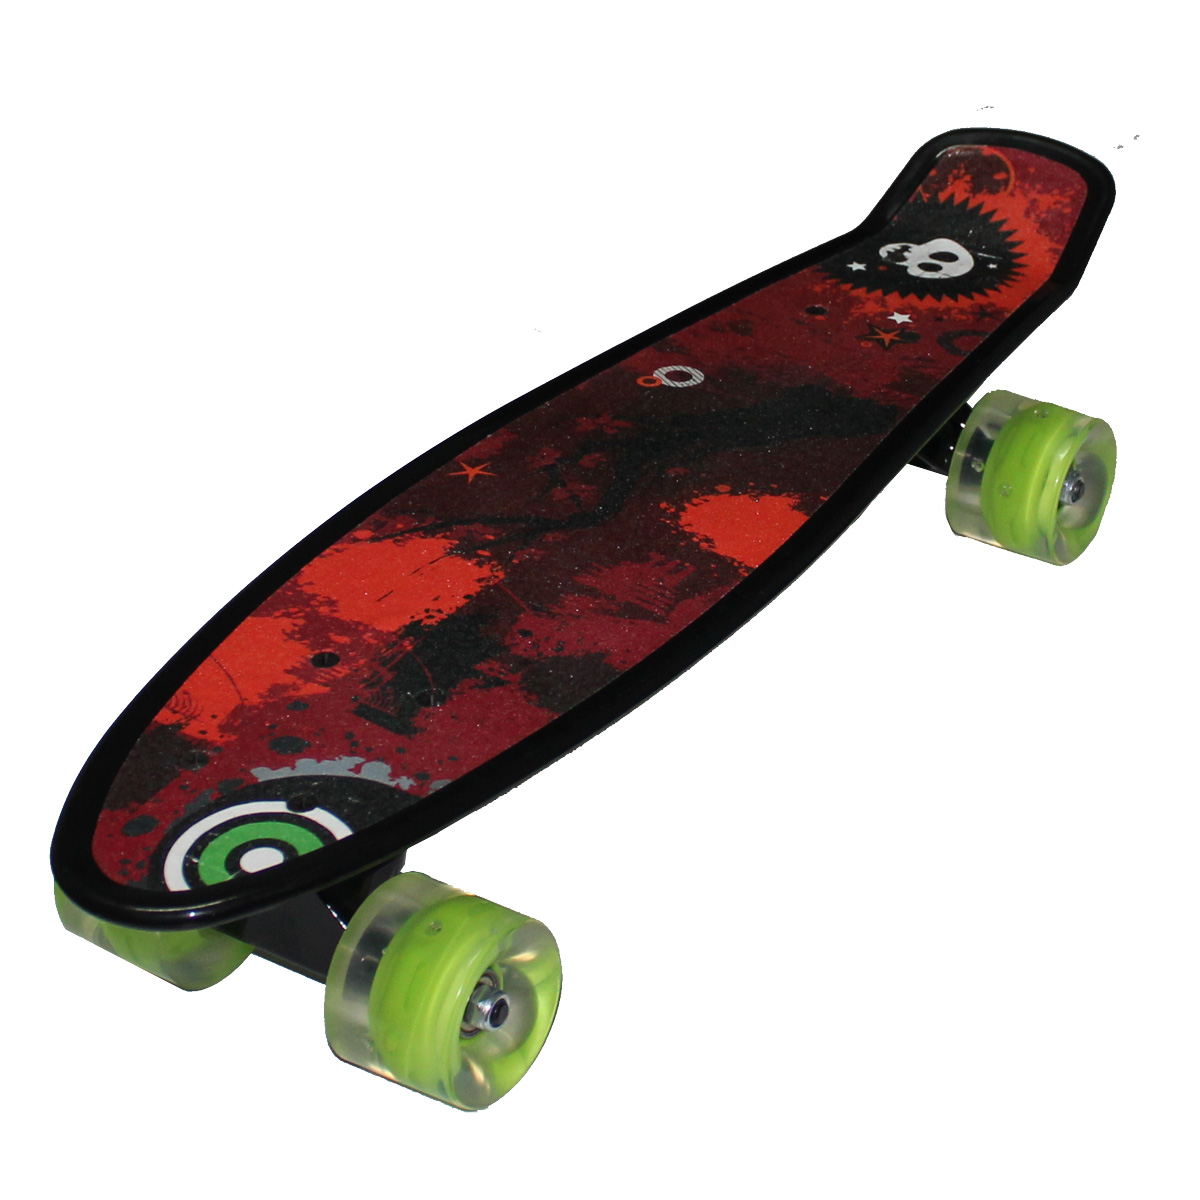 SKB393 Penny Skateboard with Flashing Wheels   RCL Sport ...